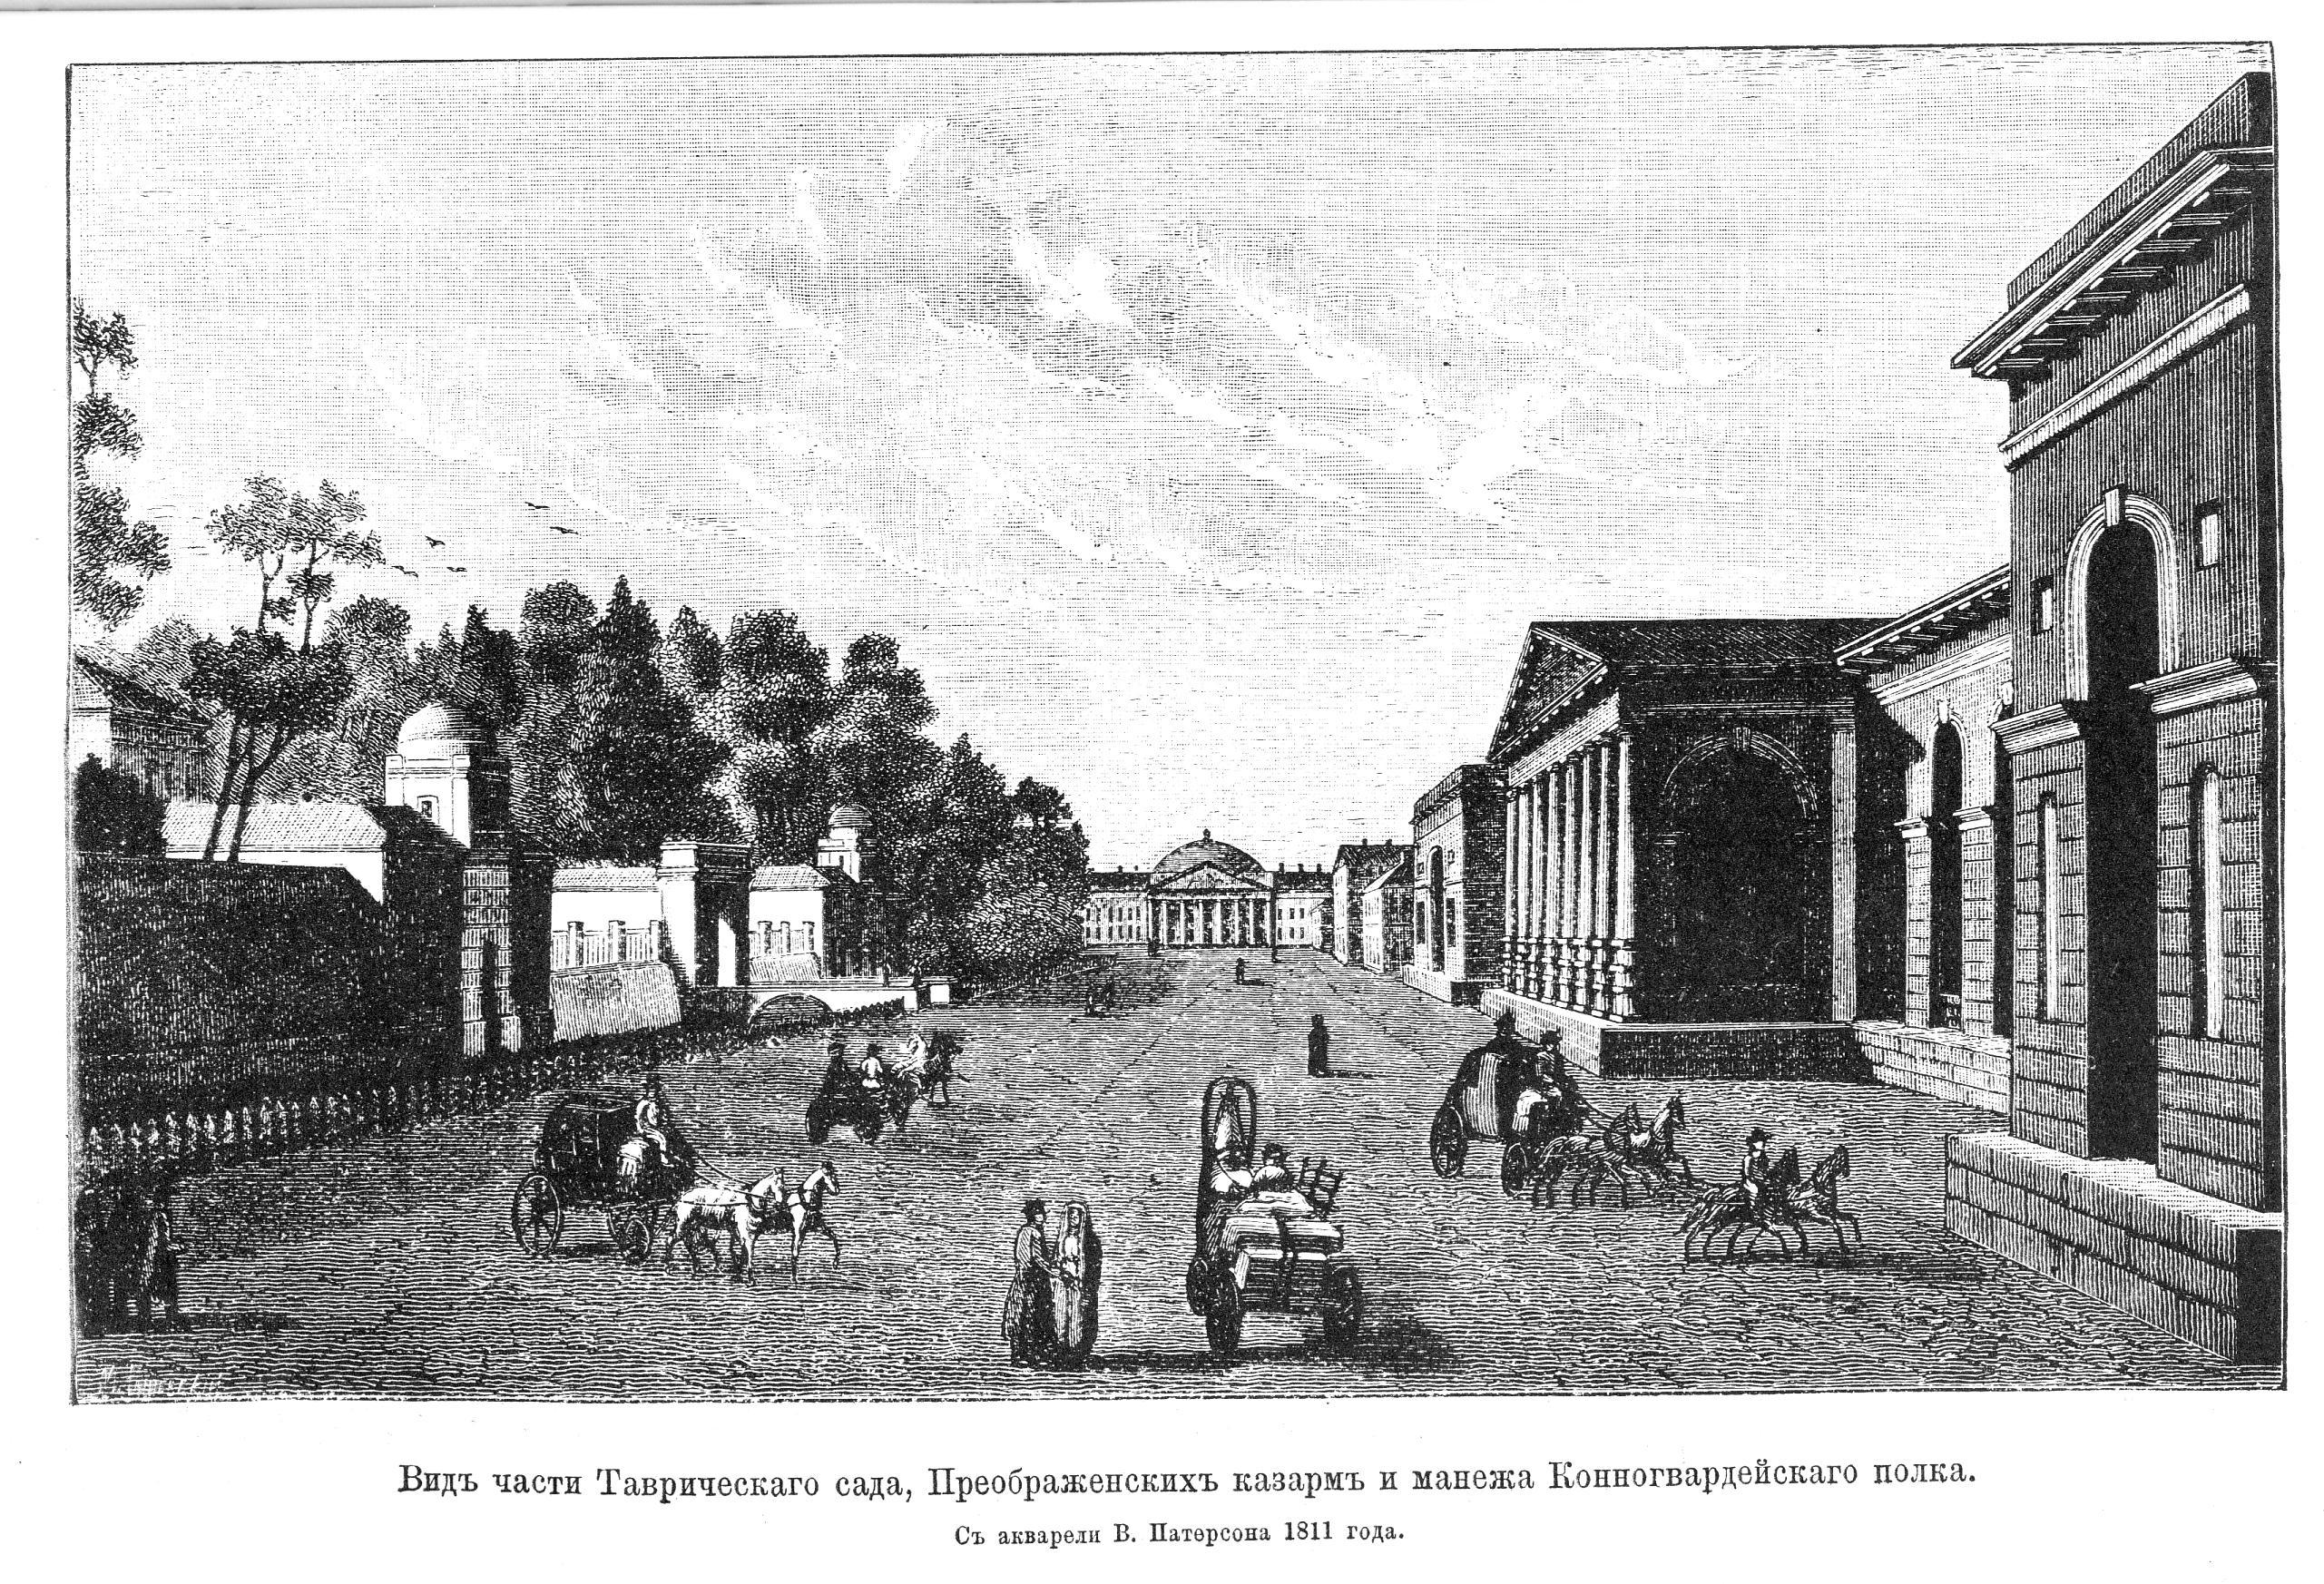 Вид части Таврического сада